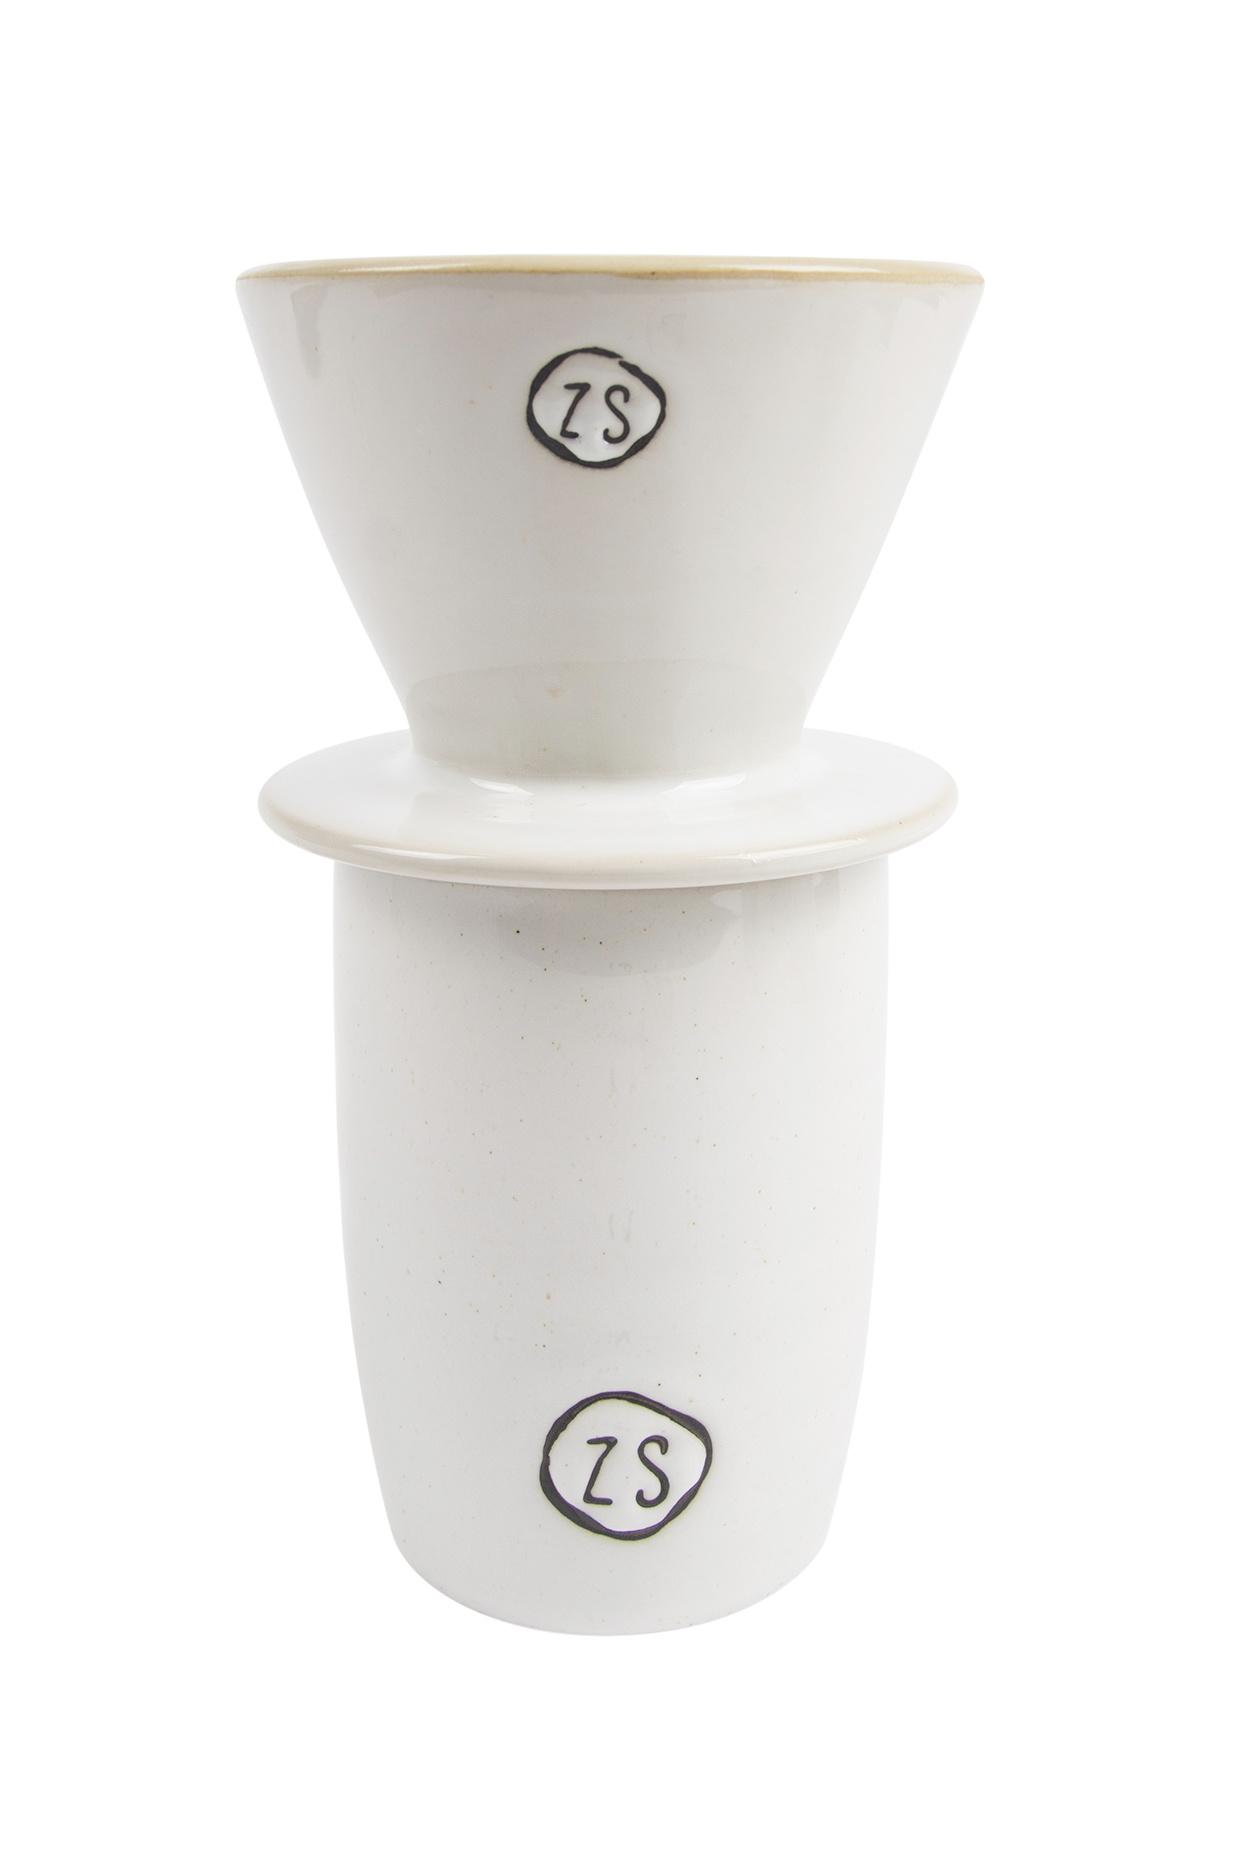 Zusss koffiefilterhouder aardewerk -  wit